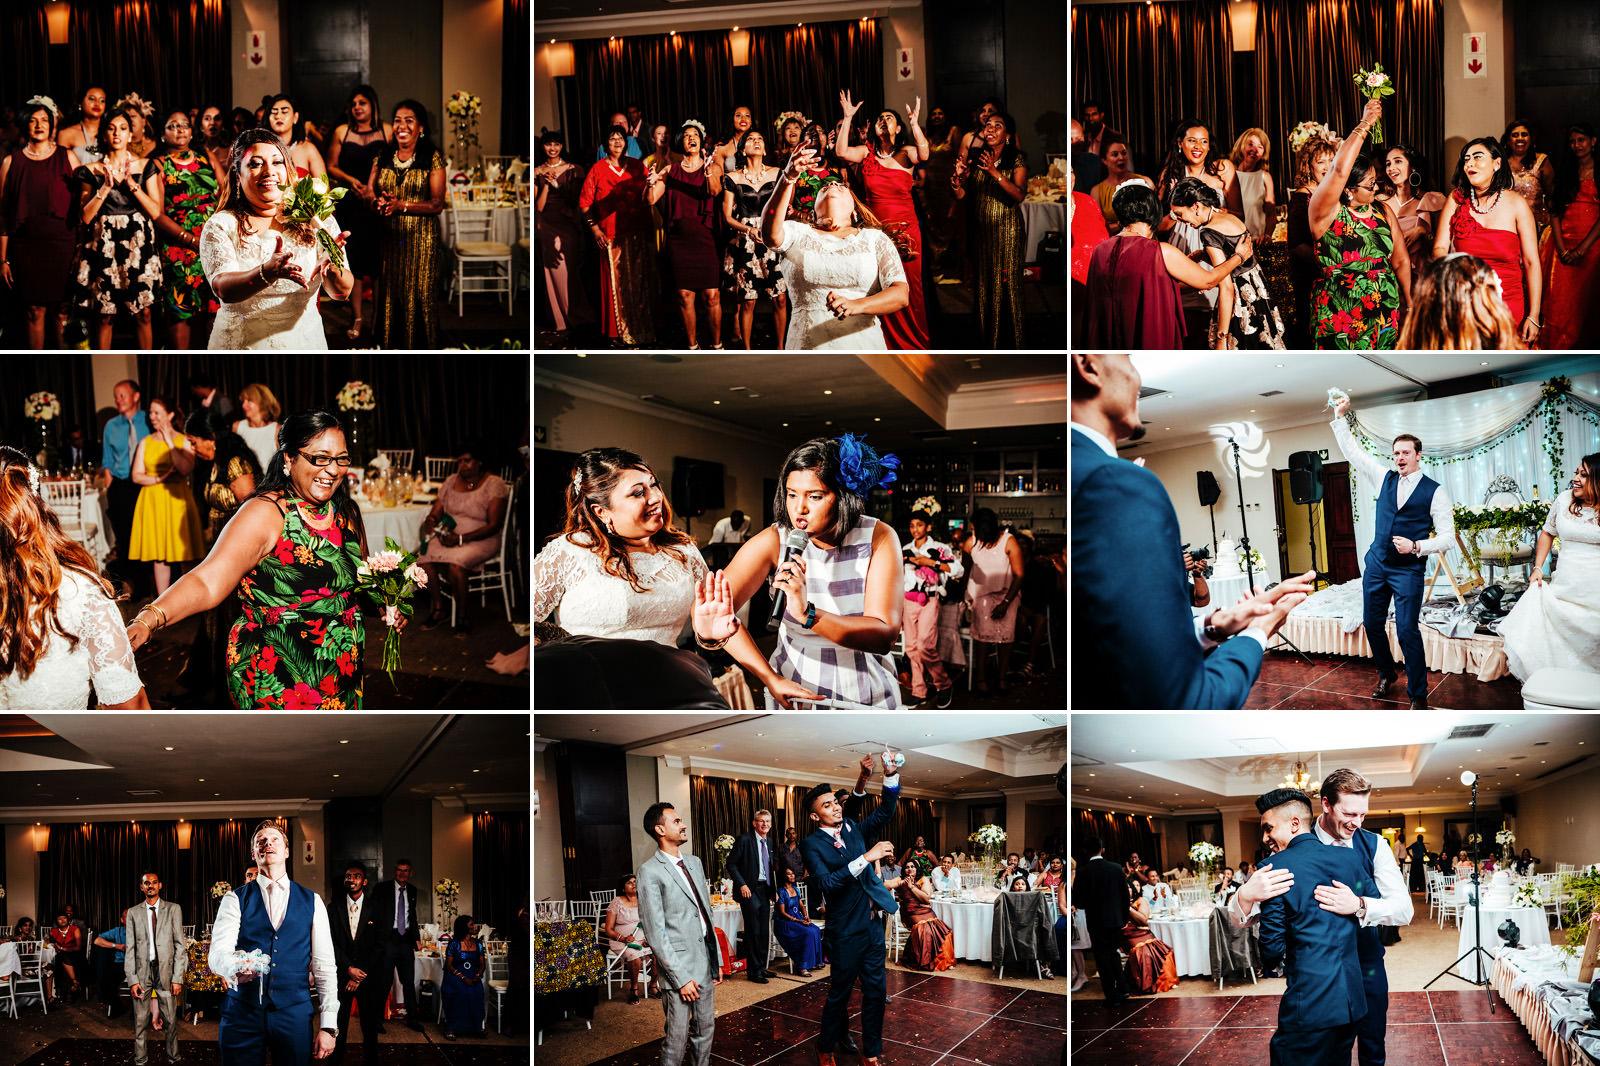 Mt_Edgecombe_Durban_Wedding_Photography_RBadal_31.jpg